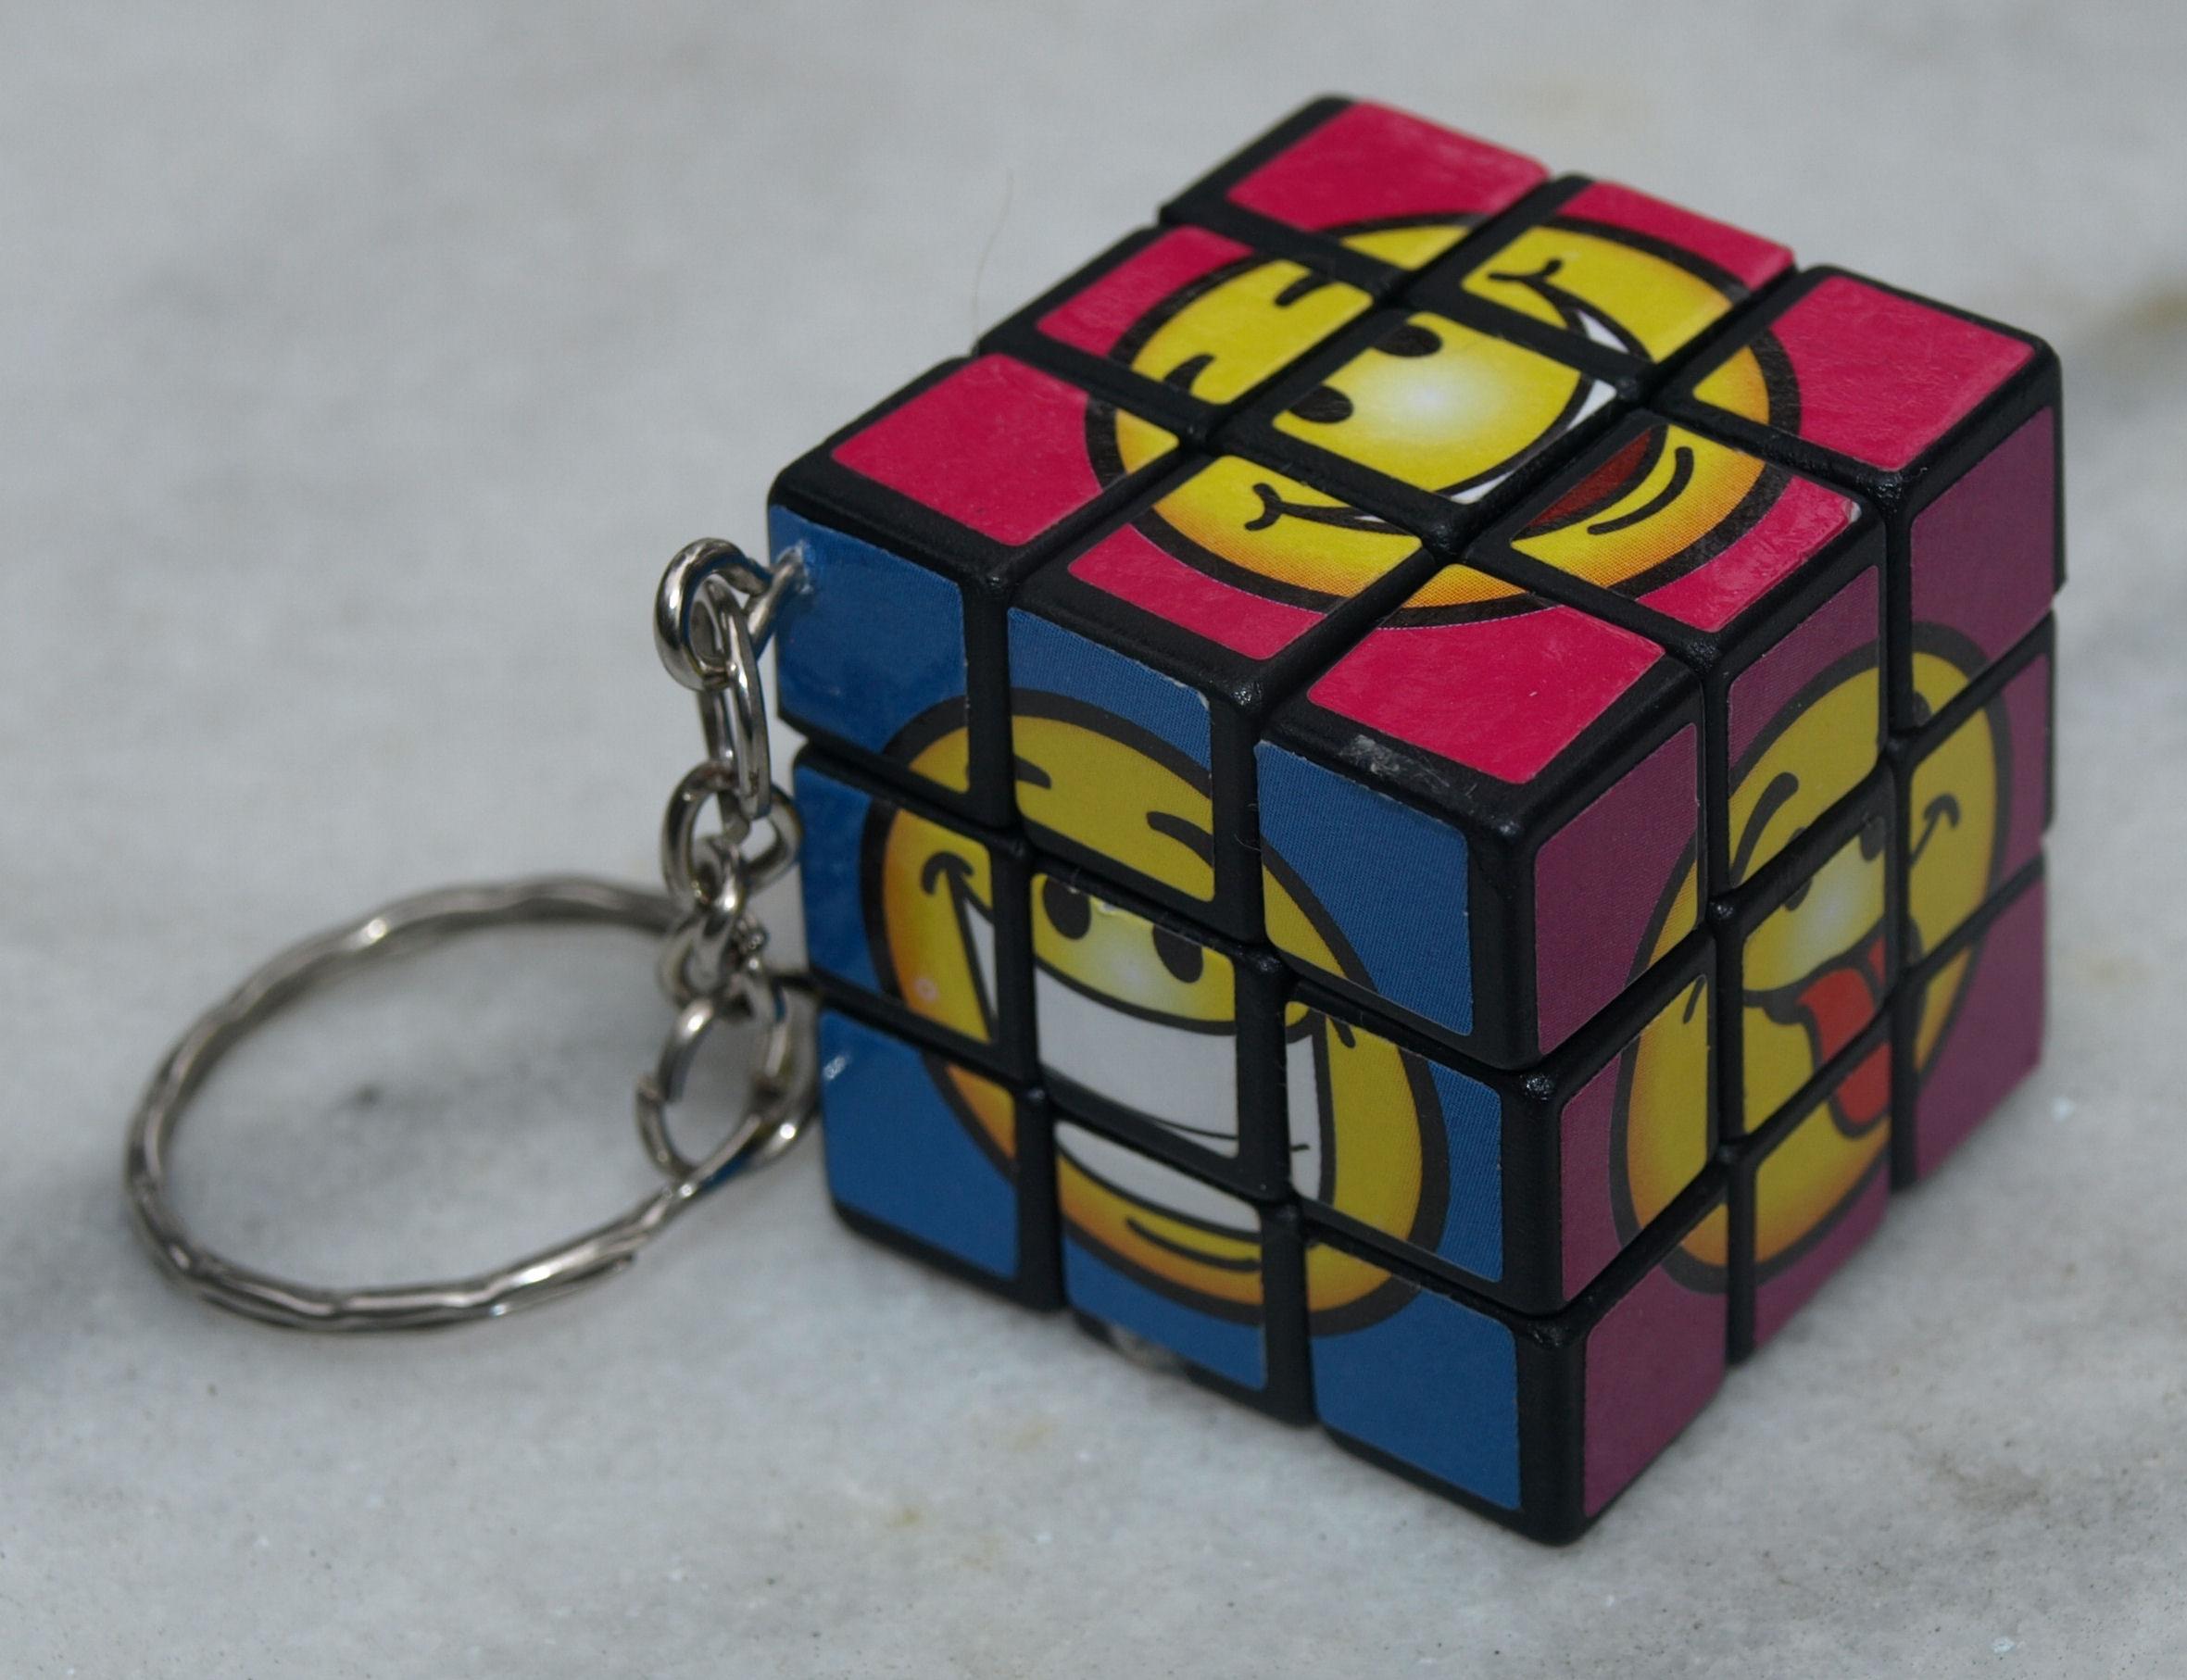 Rubik's Cube - Wikipedia, the free.